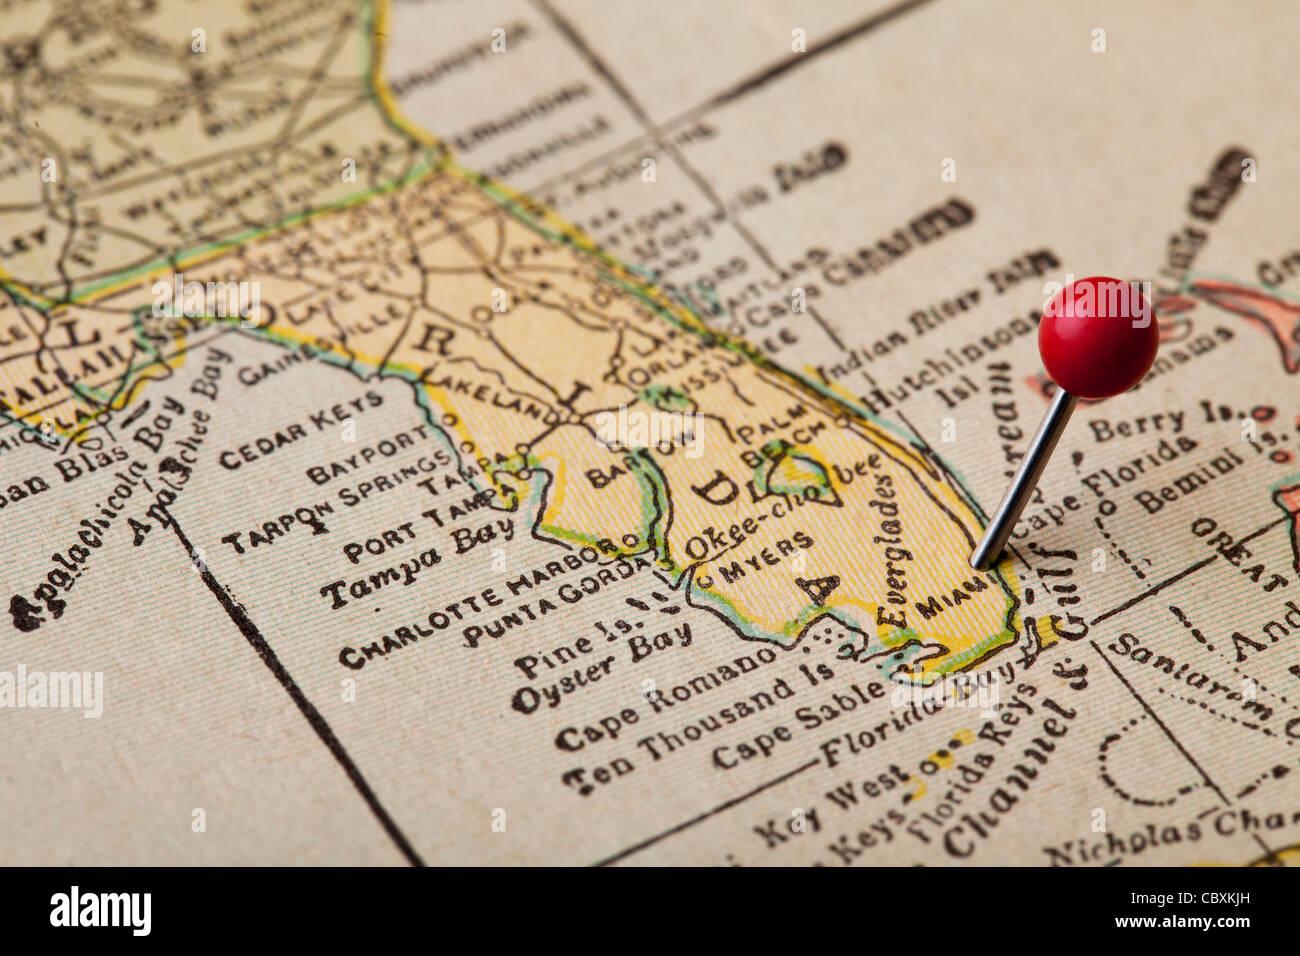 Map Of Florida Bay.Florida Bay Map Stock Photos Florida Bay Map Stock Images Alamy